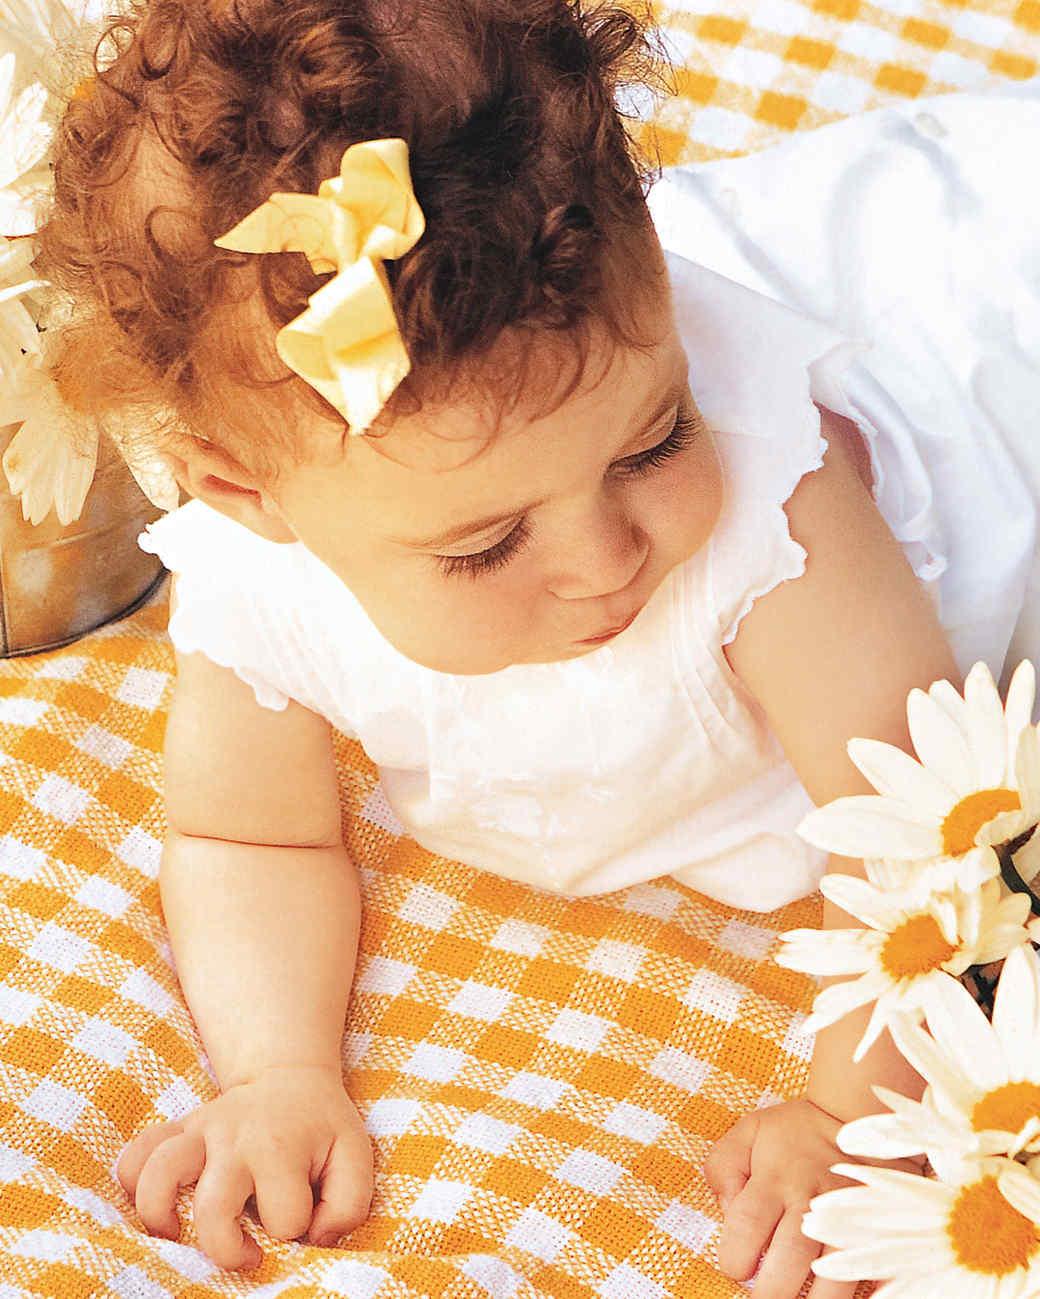 daisys-birthday-ms1029-daisy1.jpg